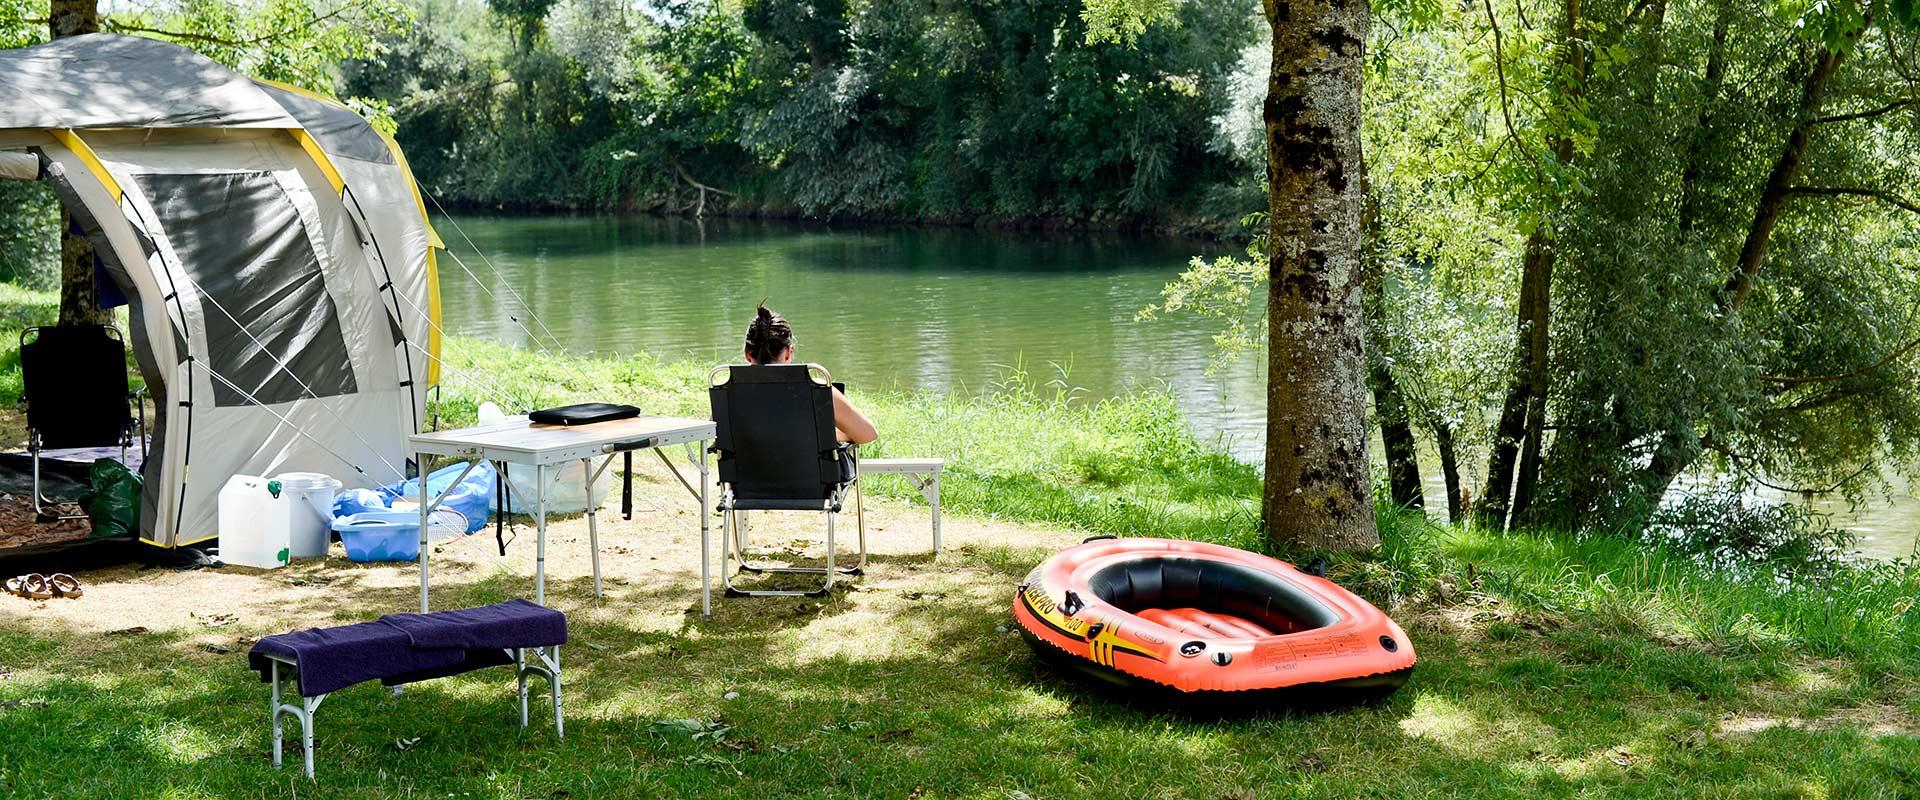 Camping Ounans La Plage Blanche mein-PLATZ